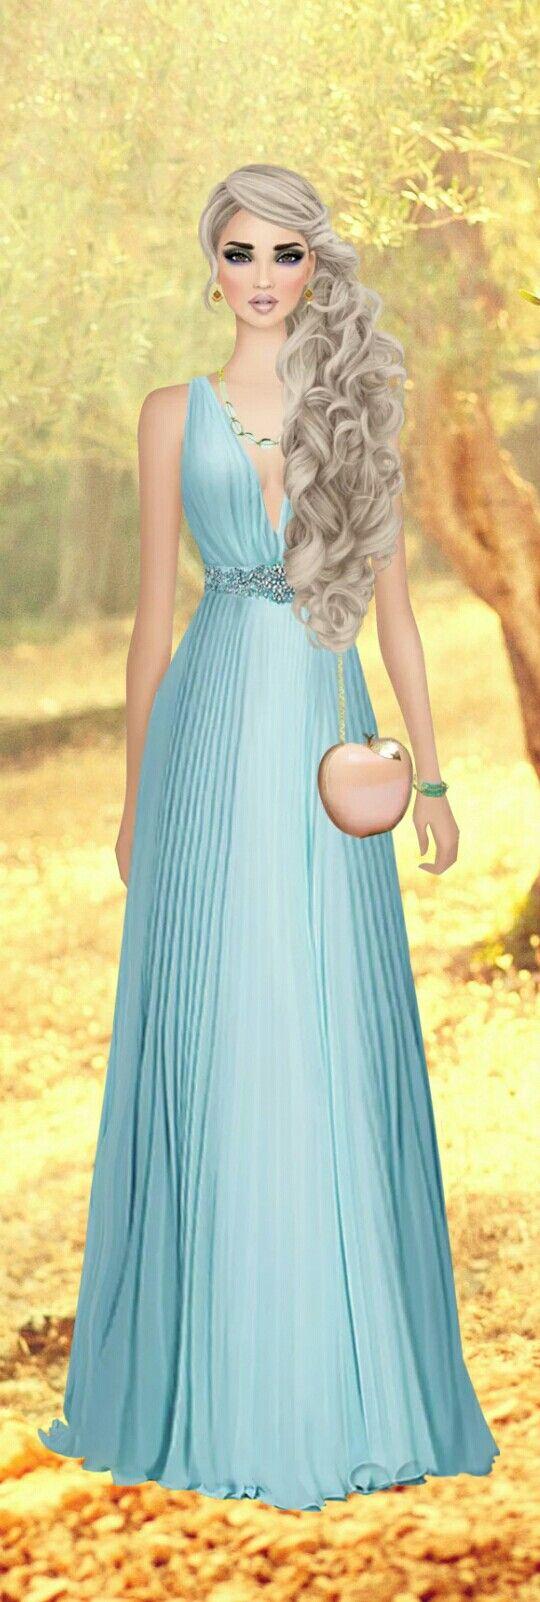 Best 750 covet fashion game ideas on Pinterest | Covet fashion ...